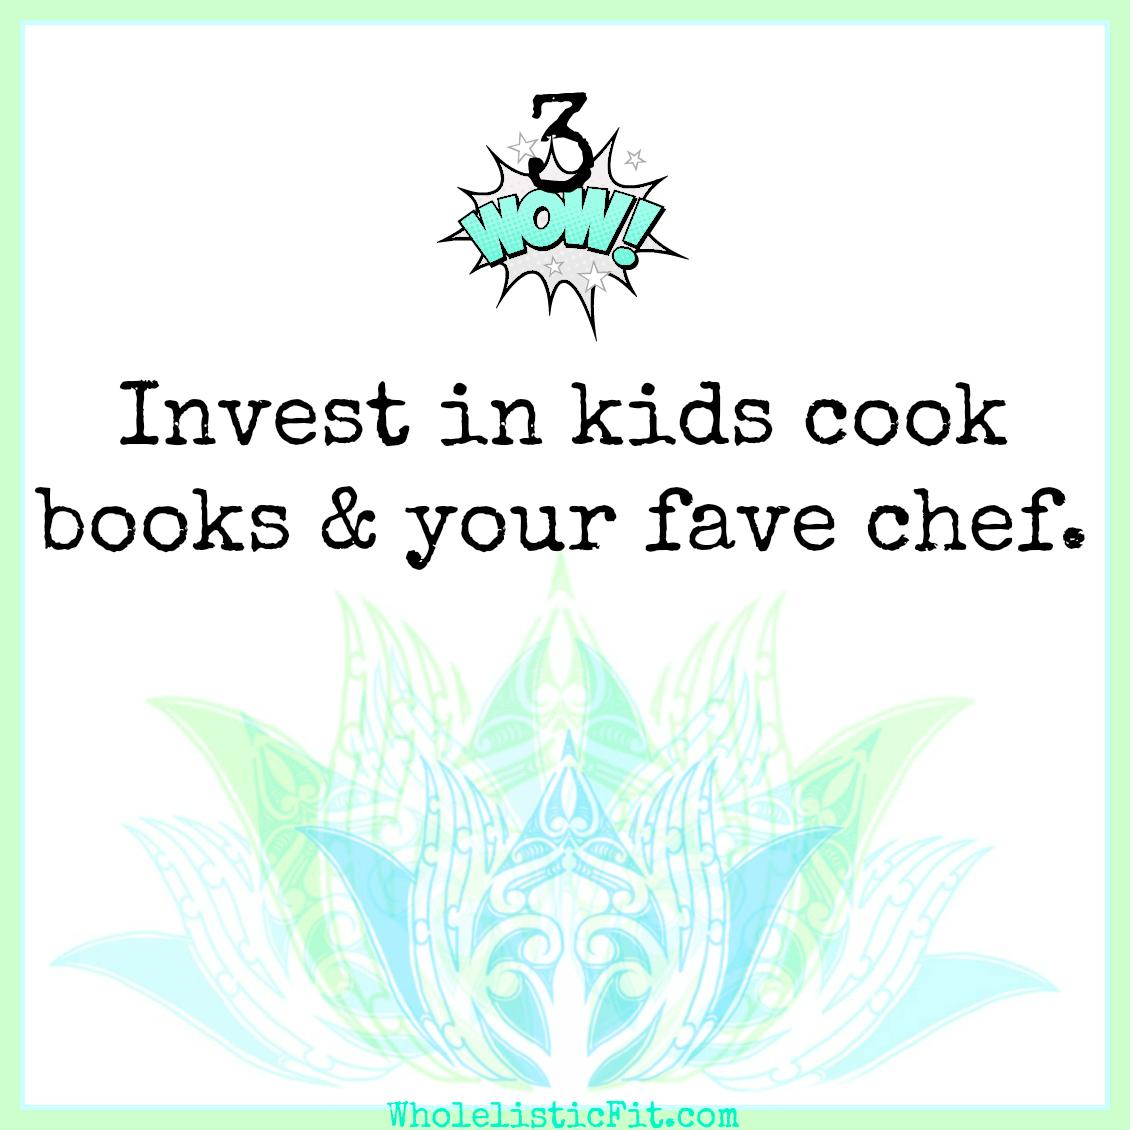 kids.cook3.jpg